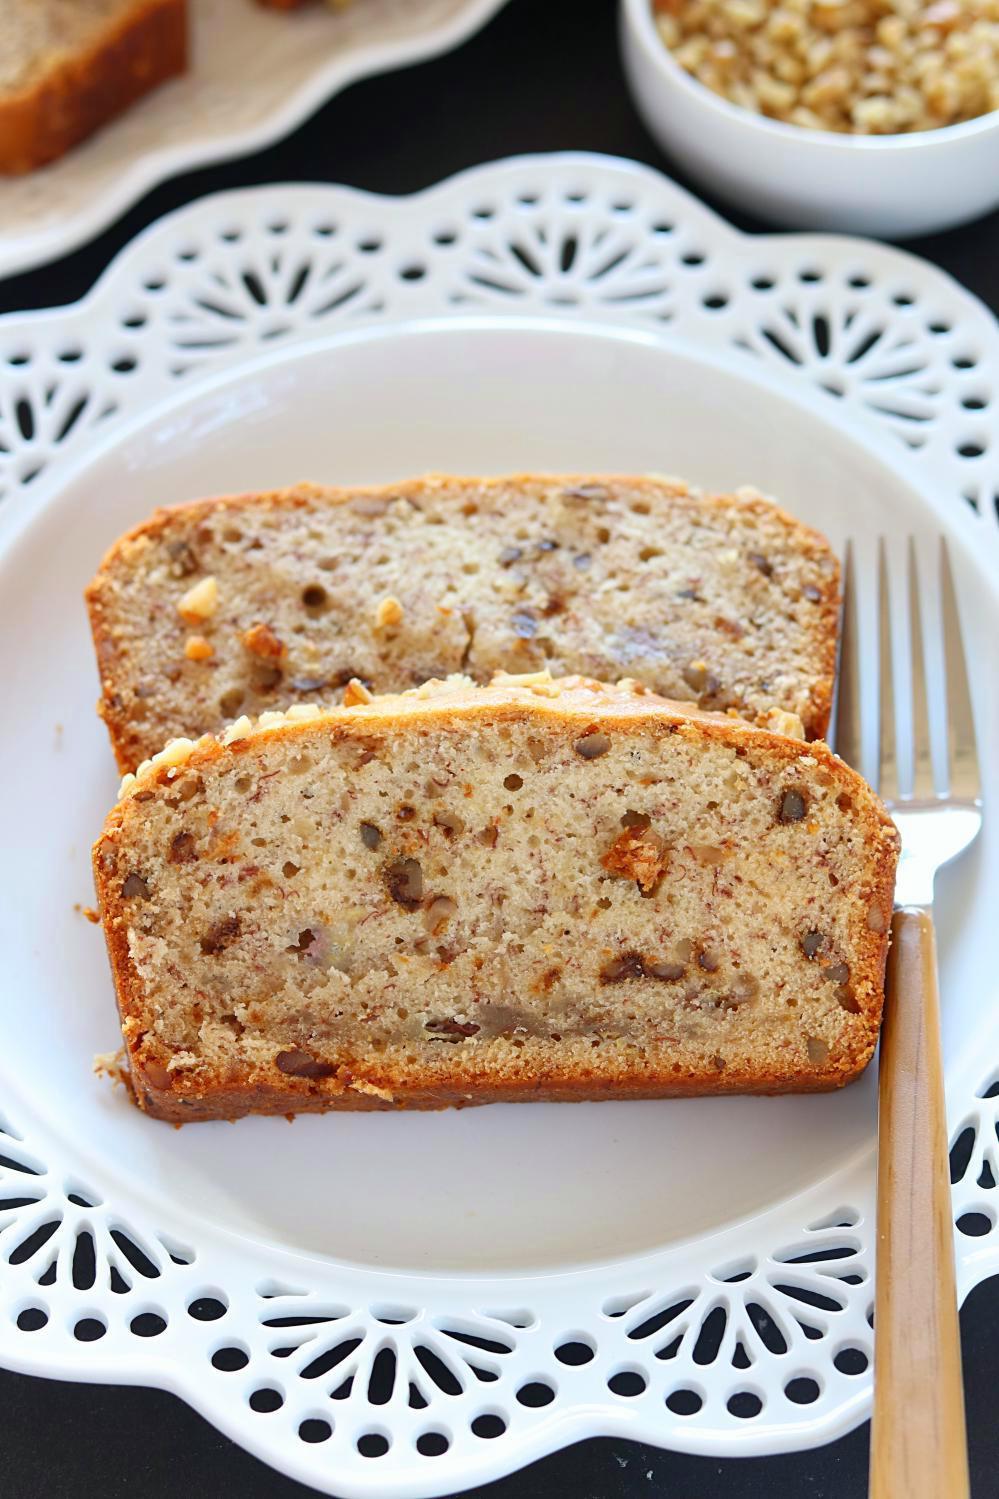 Vegan Banana Bread Recipe  Vegan Banana Nut Bread healthy Banana walnut loaf bread